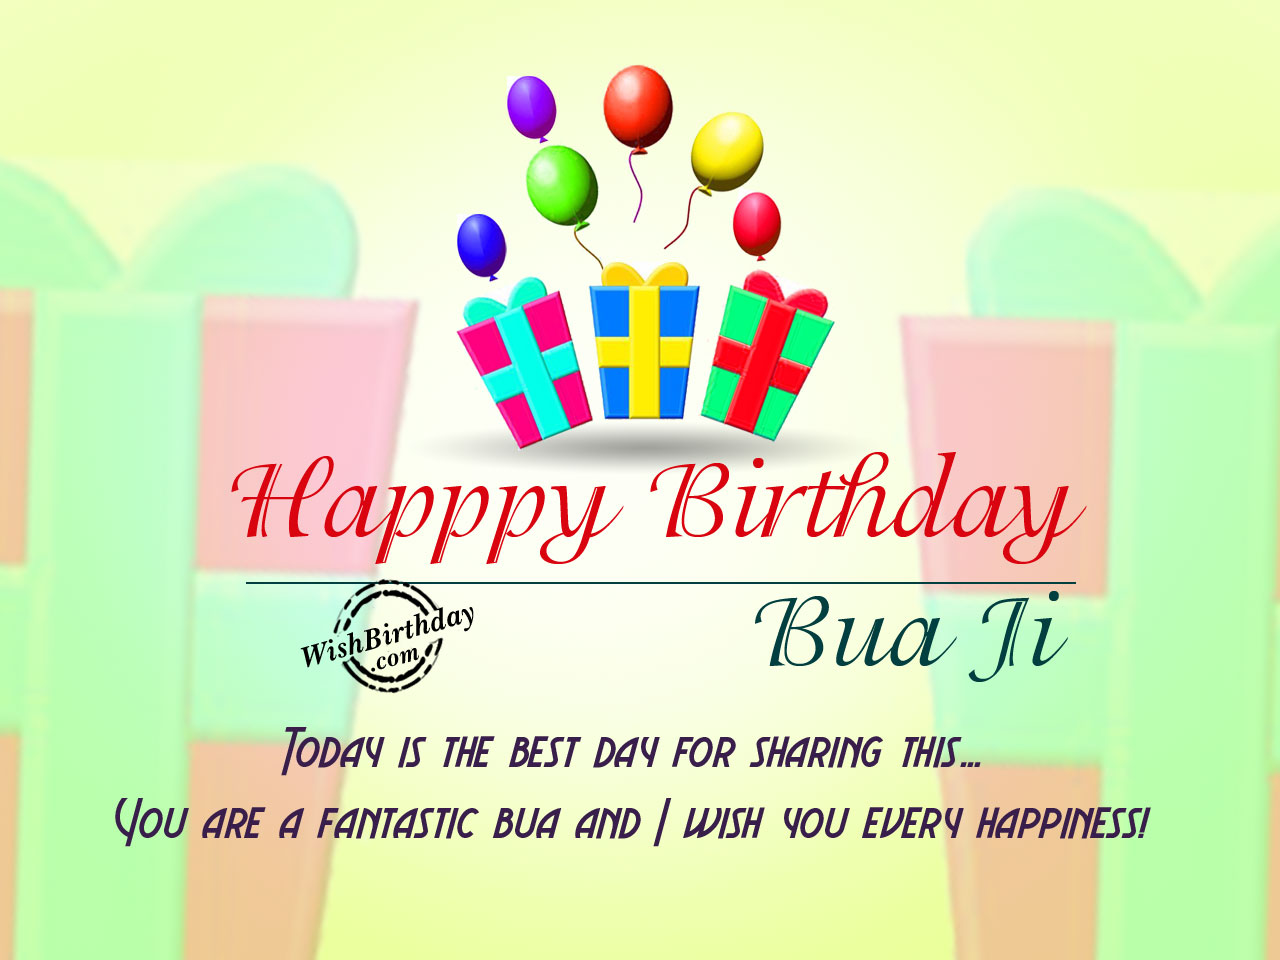 share your birthday wishes - photo #40